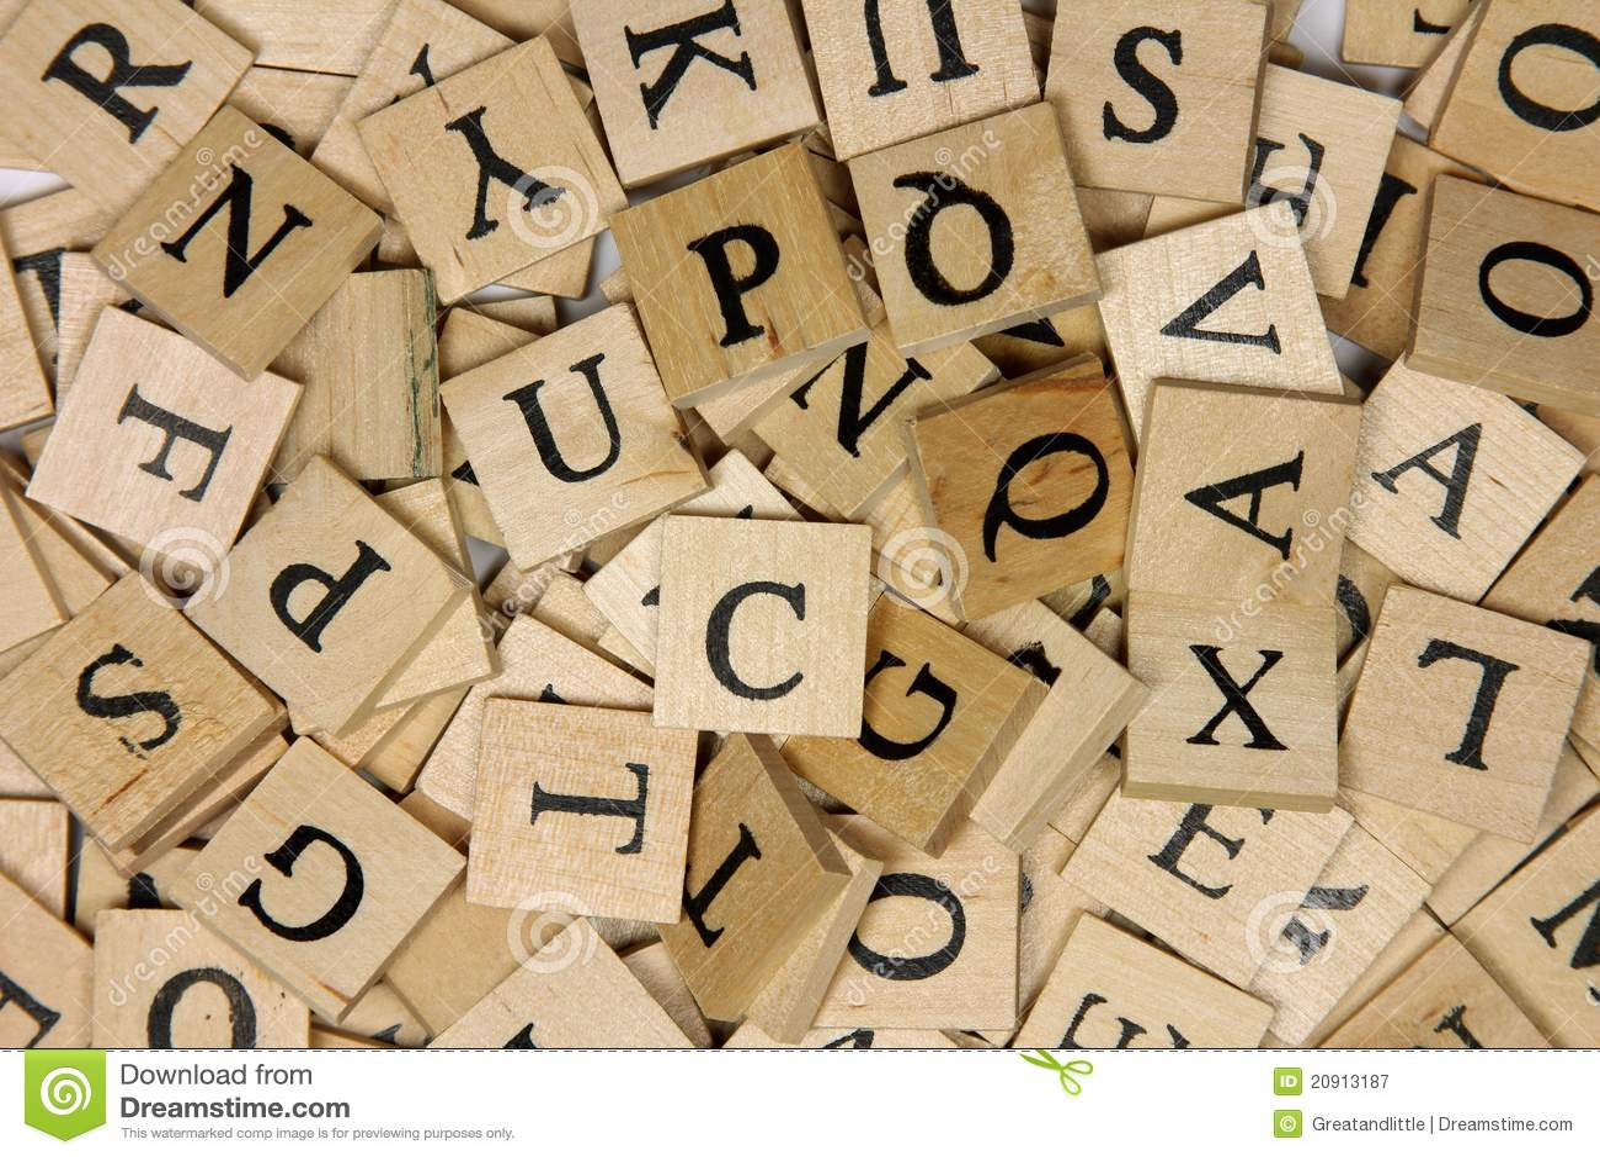 Wooden letter tiles stock image. Image of wood, tile   20913187